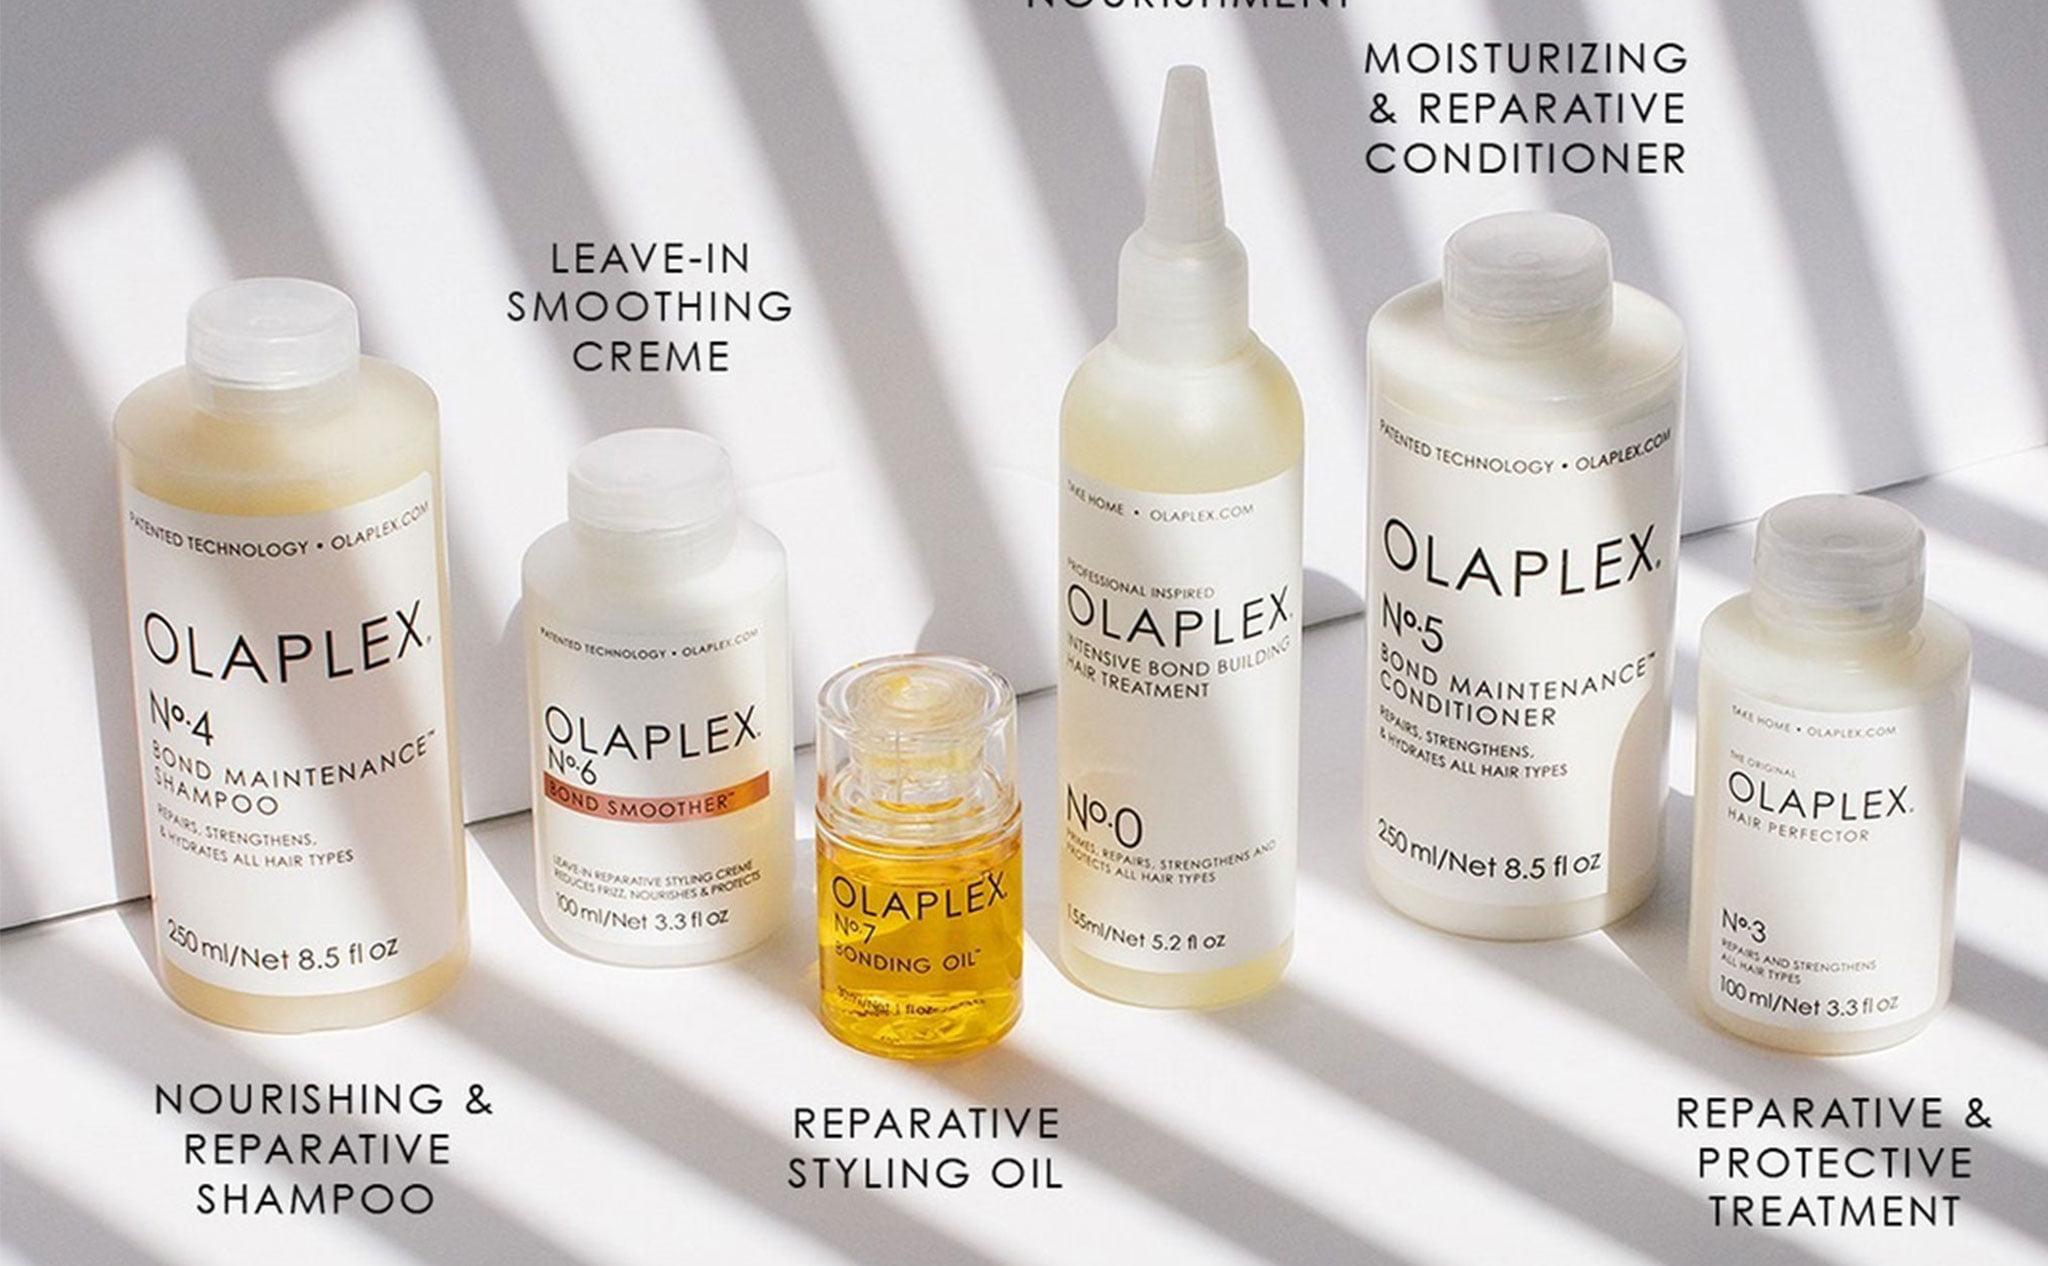 Comprar productos Olaplex en Dénia – The Reference Studio